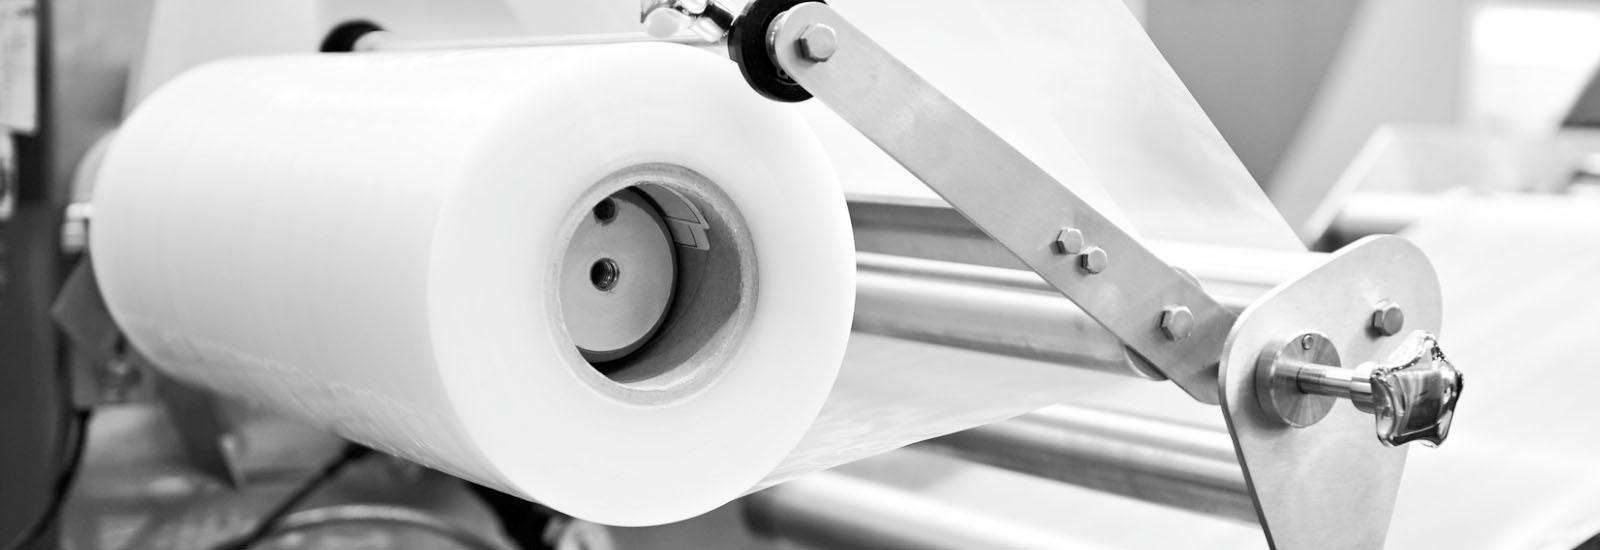 Foltex - Producent folii termokurczliwej LDPE.